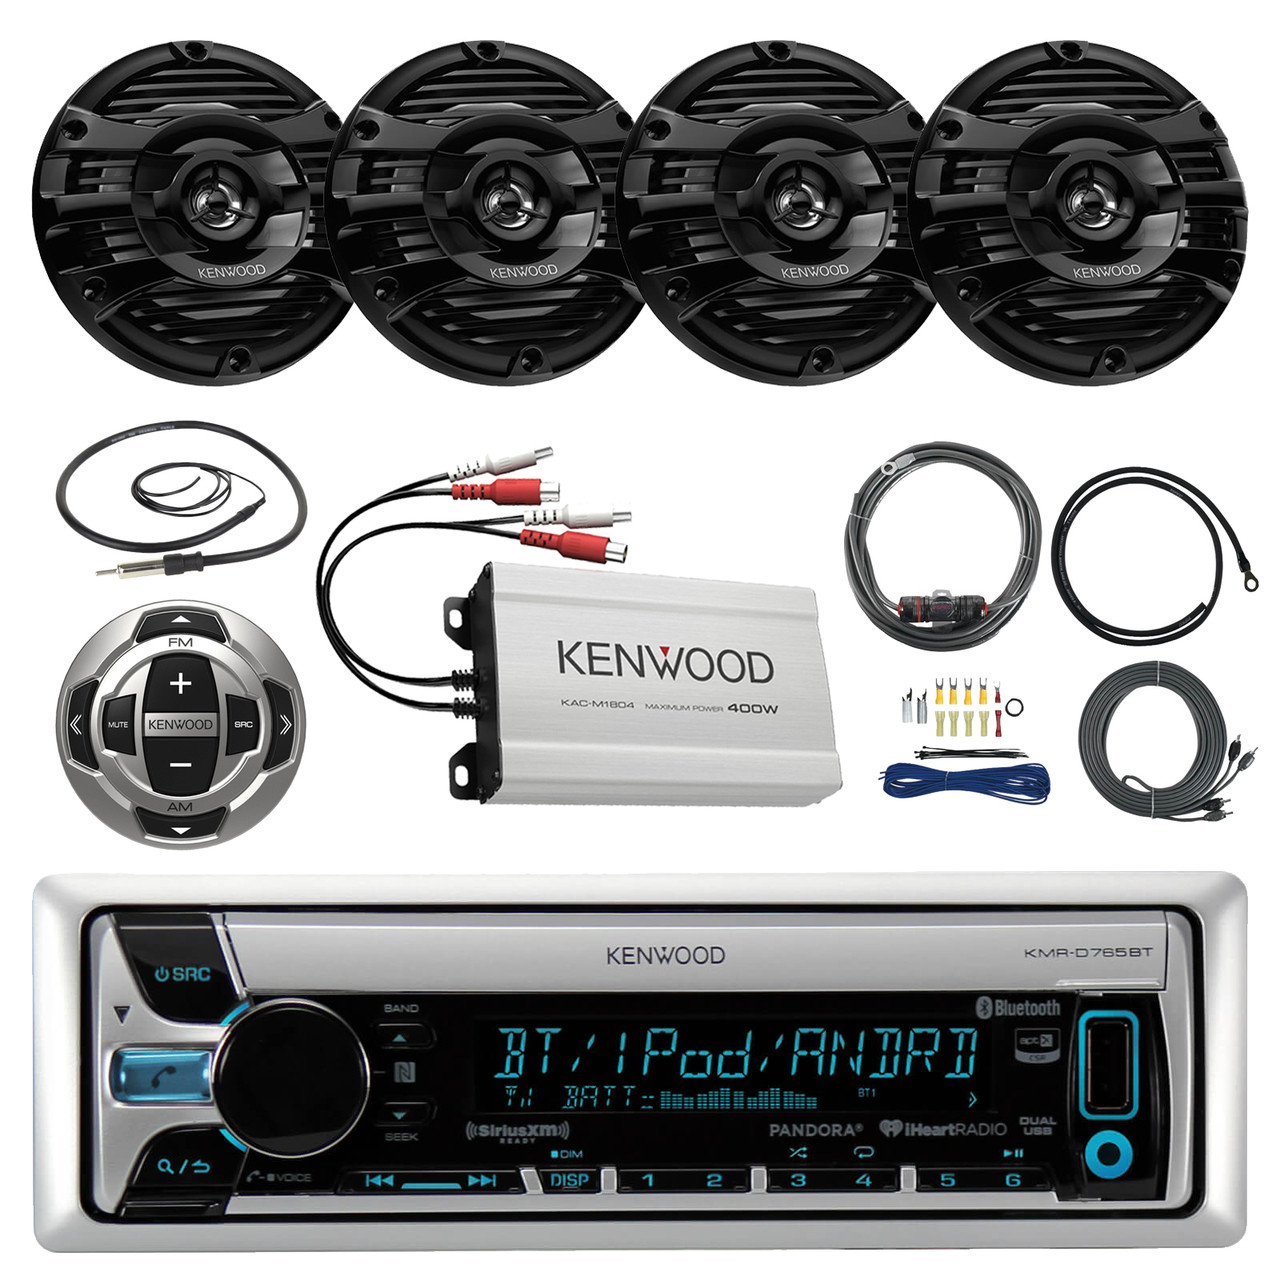 21 29 pontoon boat marine system kenwood kmr d768bt bluetooth receiver 4 x 6 5 speakers 4 channel amplifer kenwood wired remote t spec v8 series  [ 1280 x 1280 Pixel ]